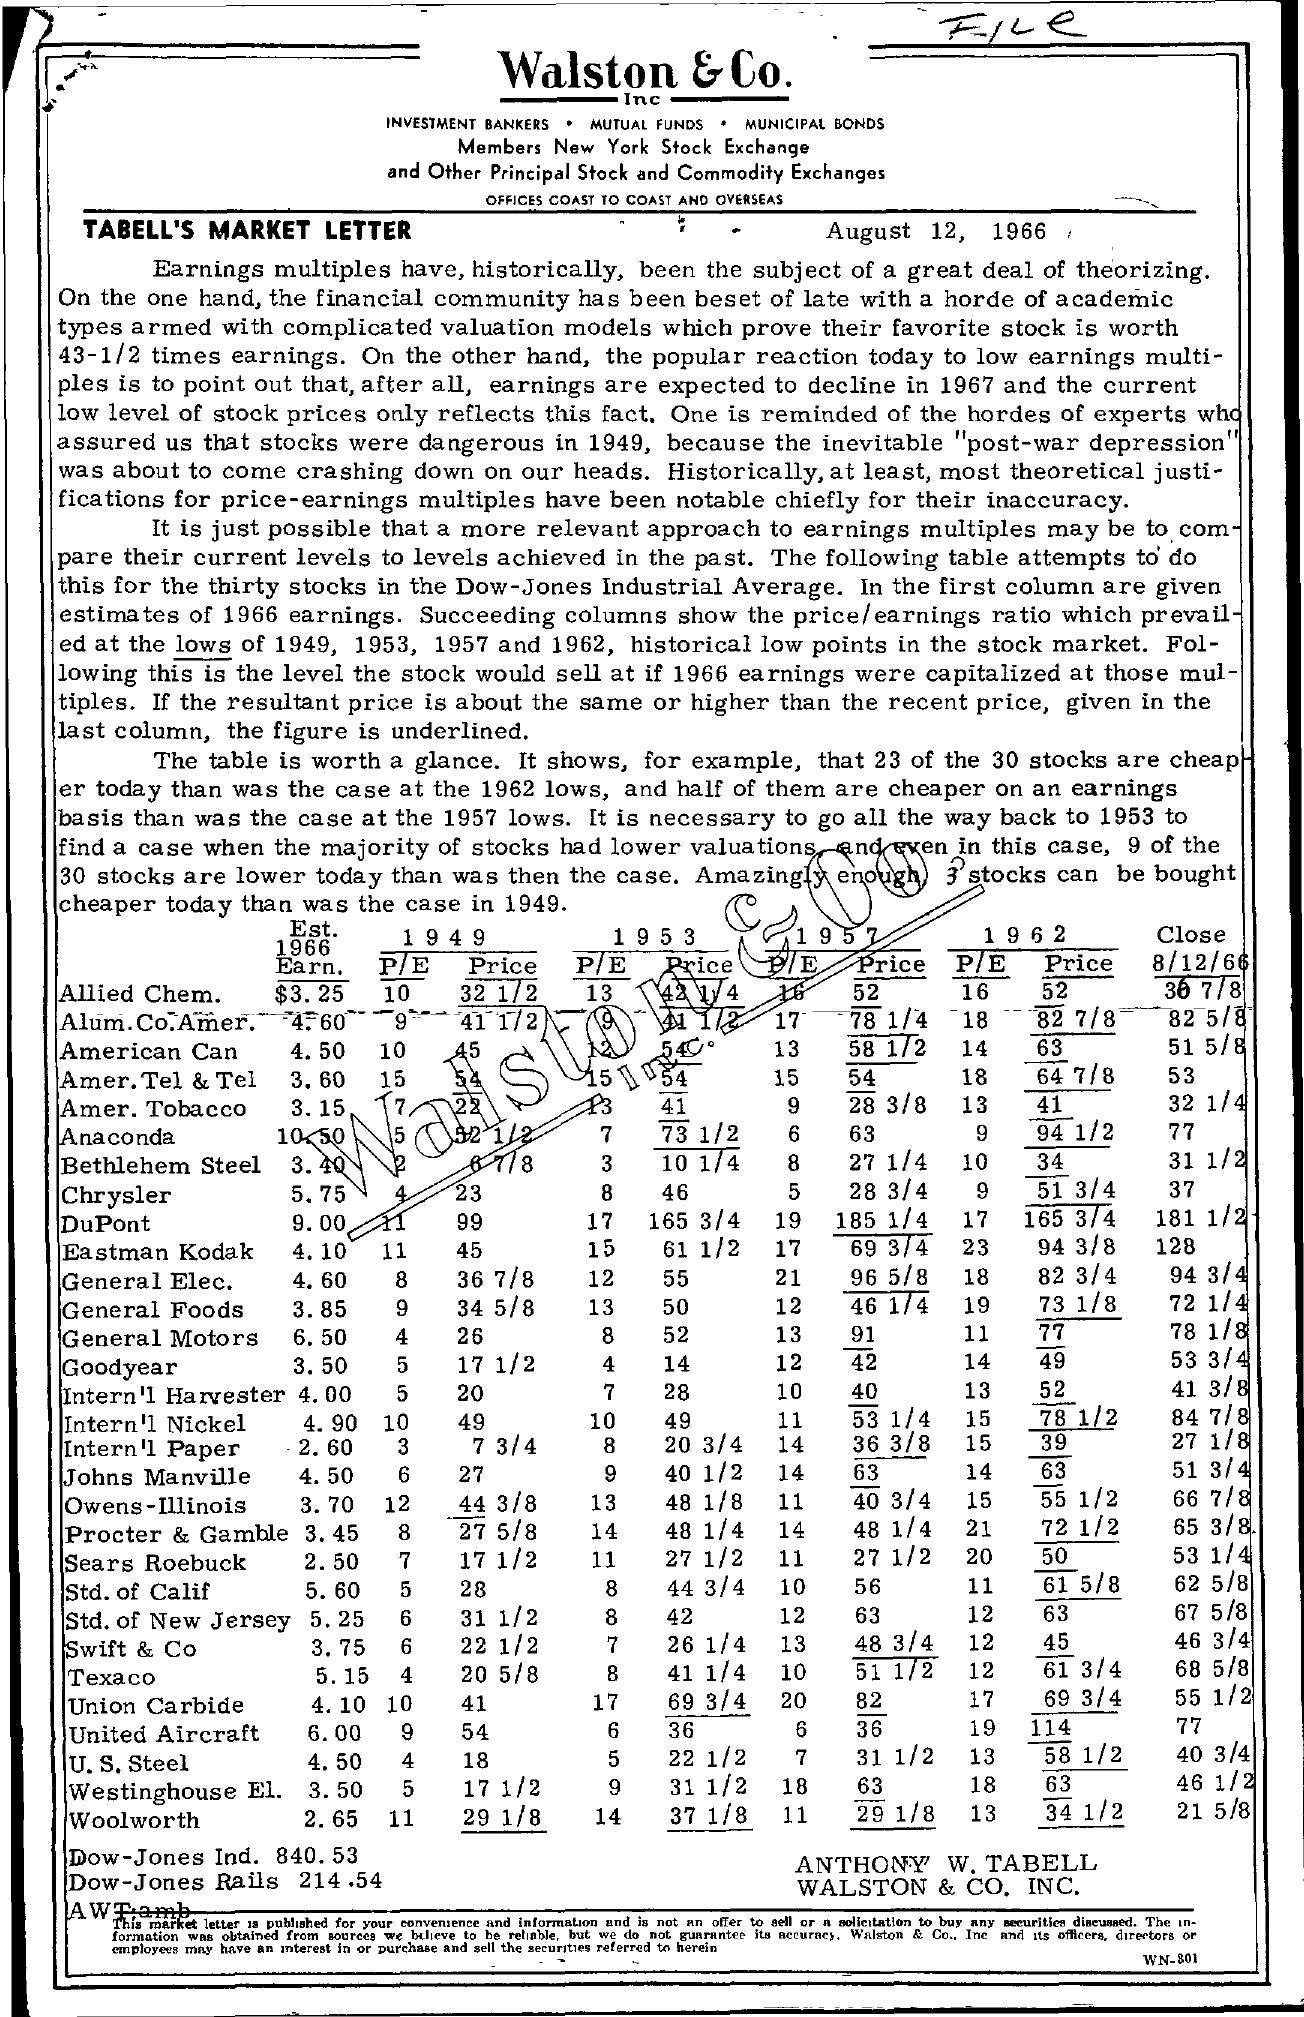 Tabell's Market Letter - August 12, 1966